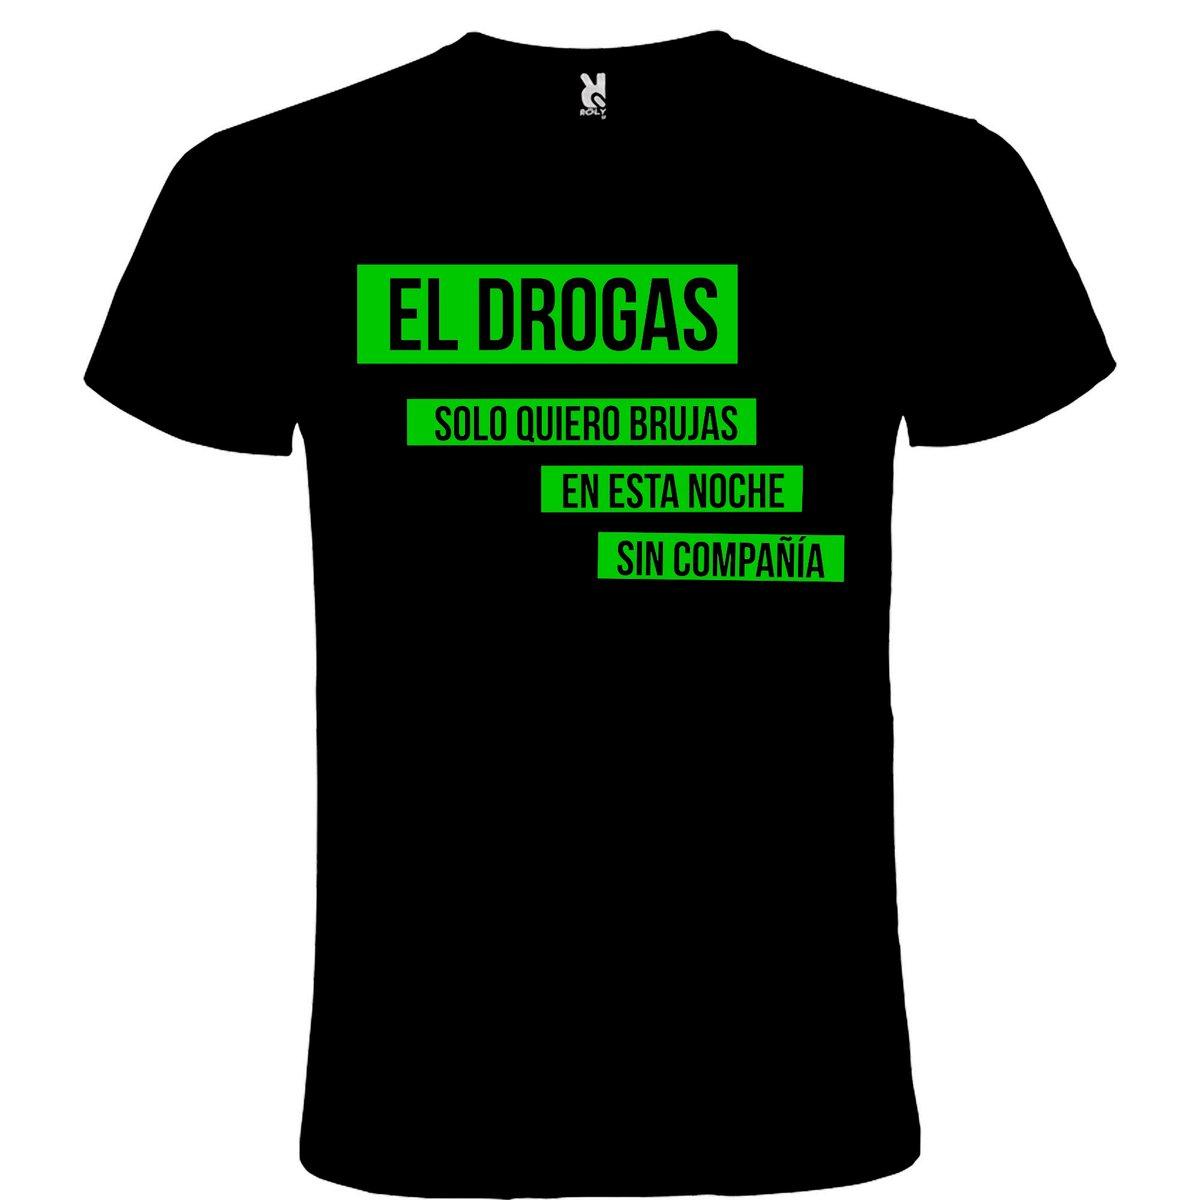 Image of Camisetas Brujas 2